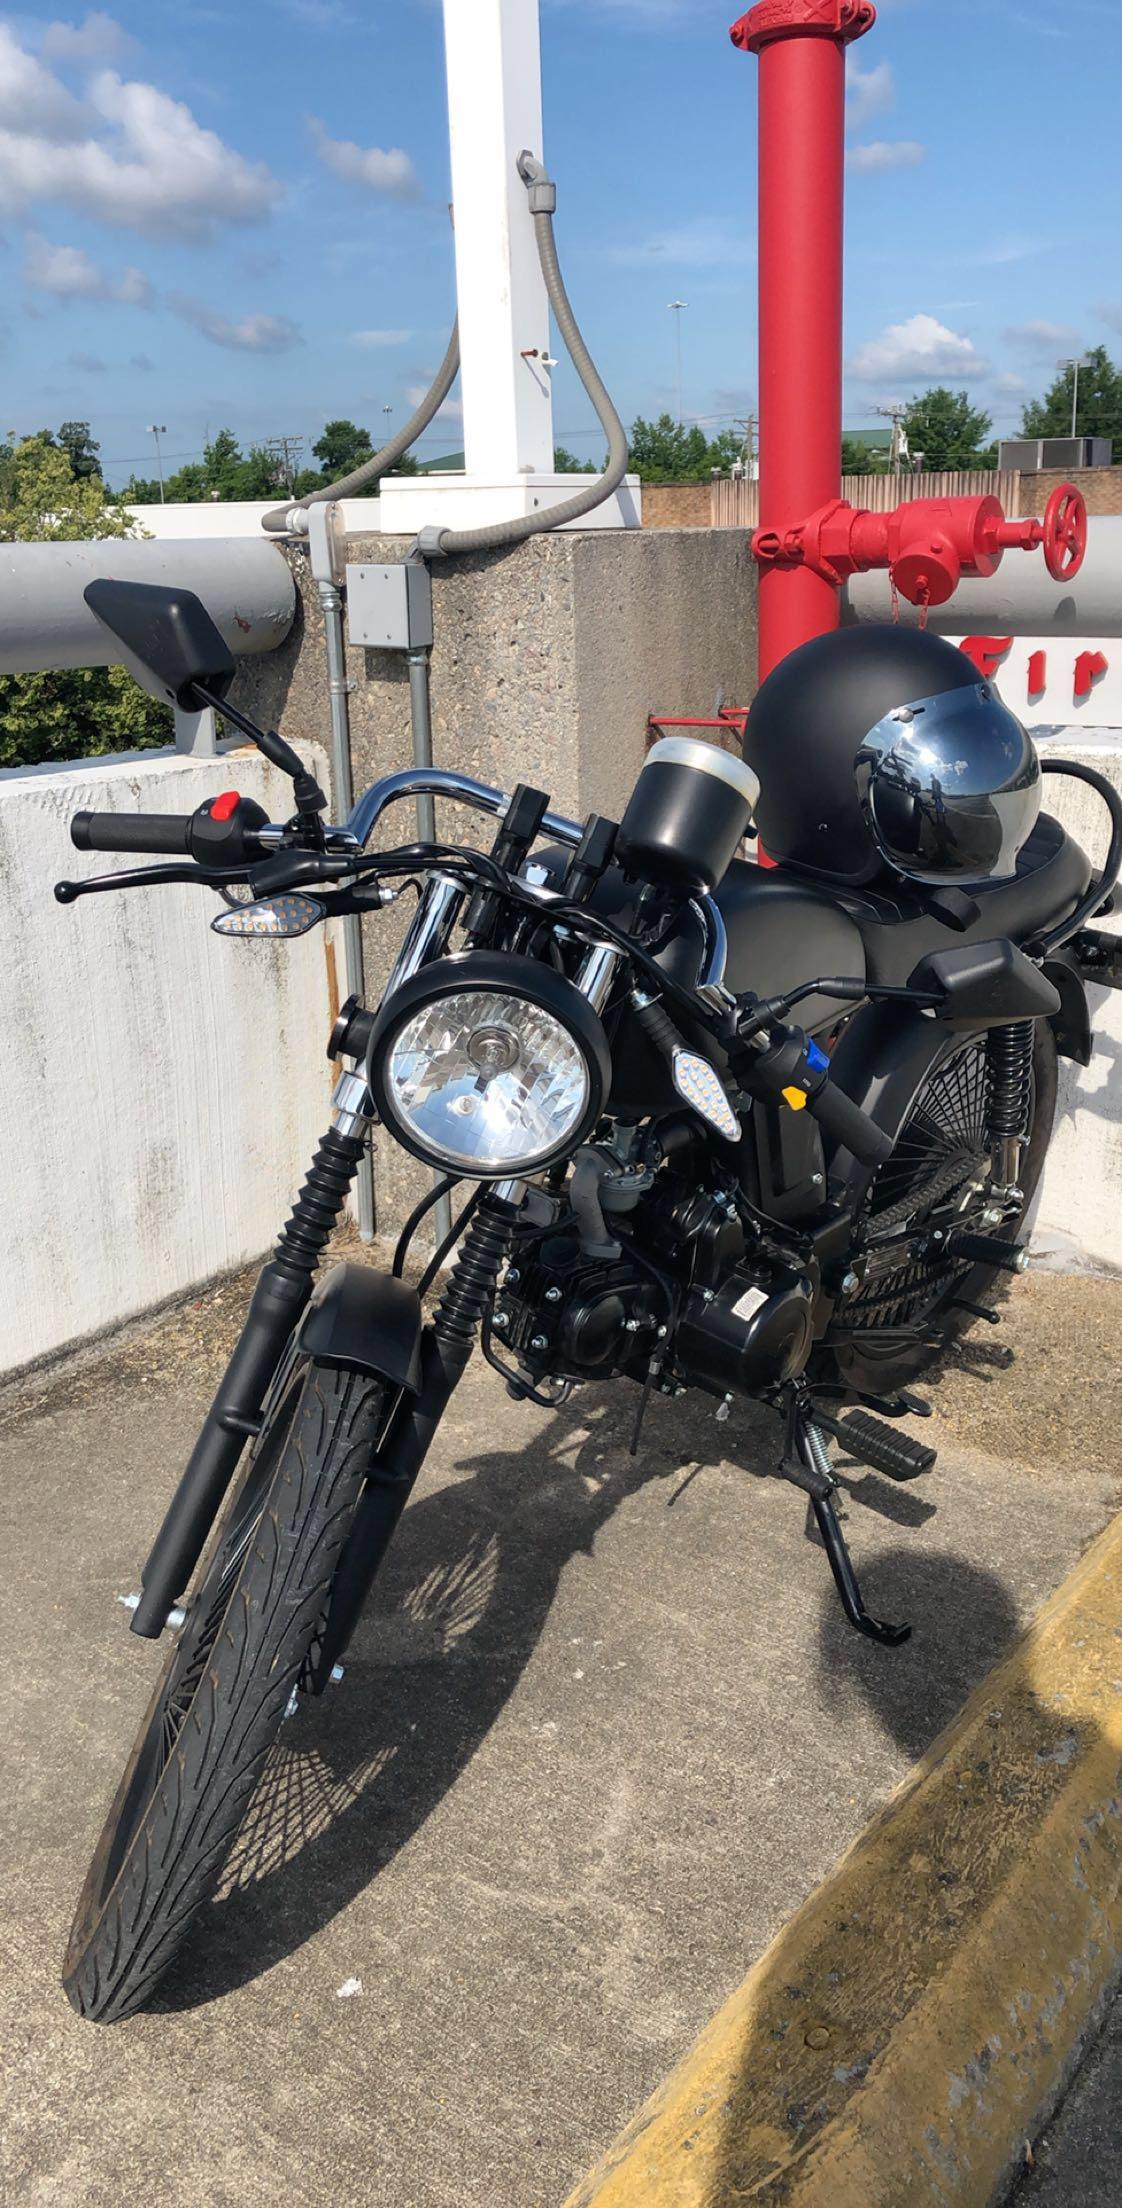 Amstar Nostalgia 49cc — Moped Army